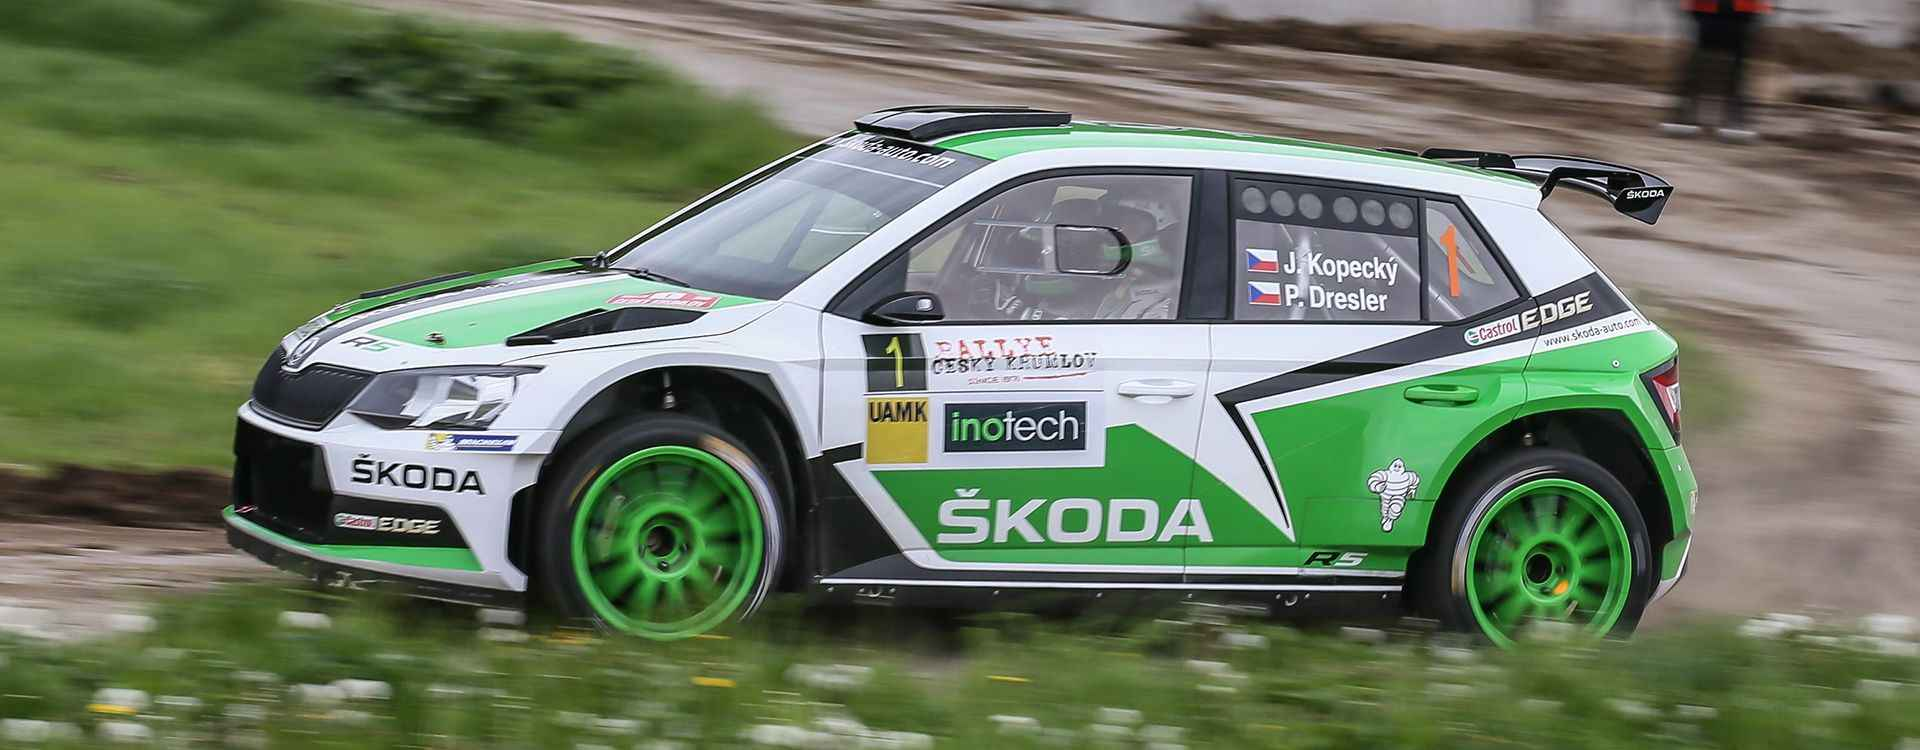 Rallye Krumlov 2015 – Jan Kopecký's Battle of Titans